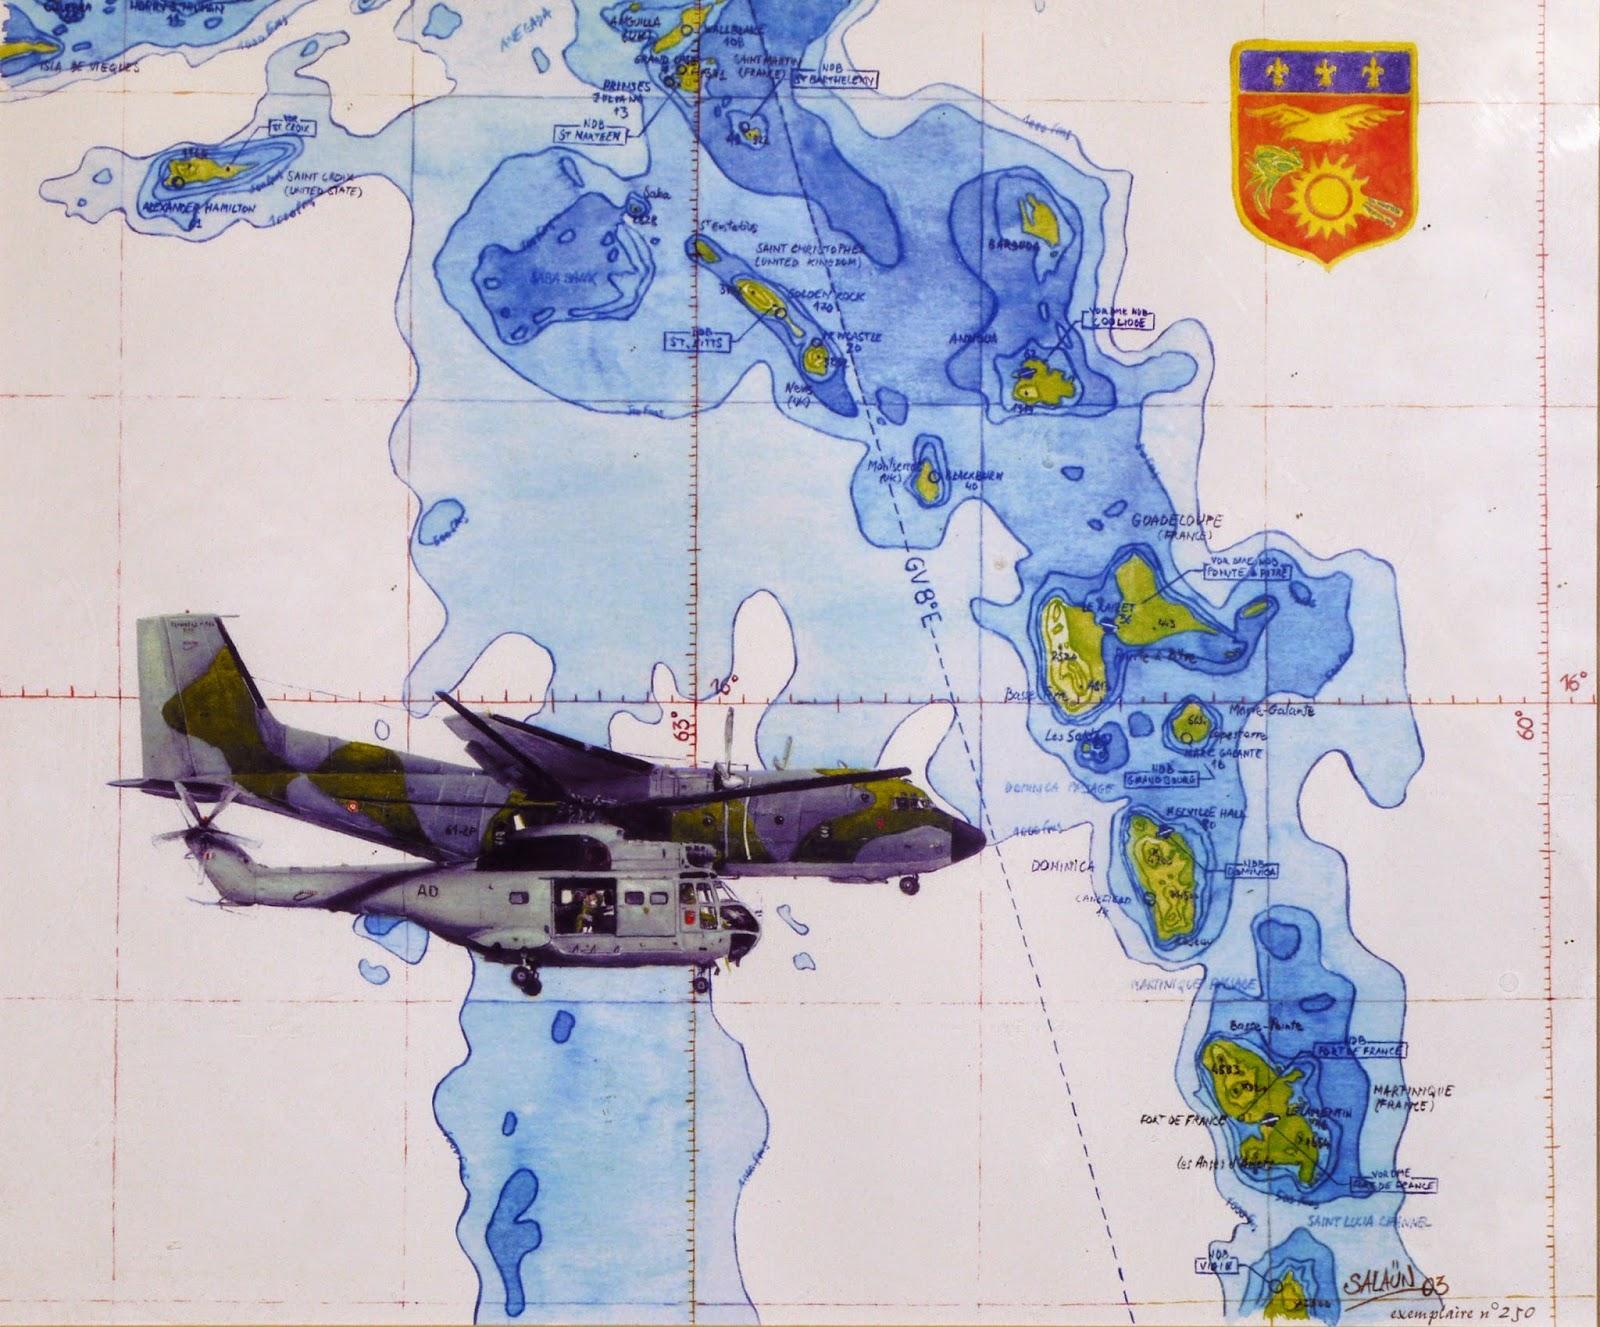 Sa-330 'PUMA' ,C-160R 'TRANSALL', aquarelle